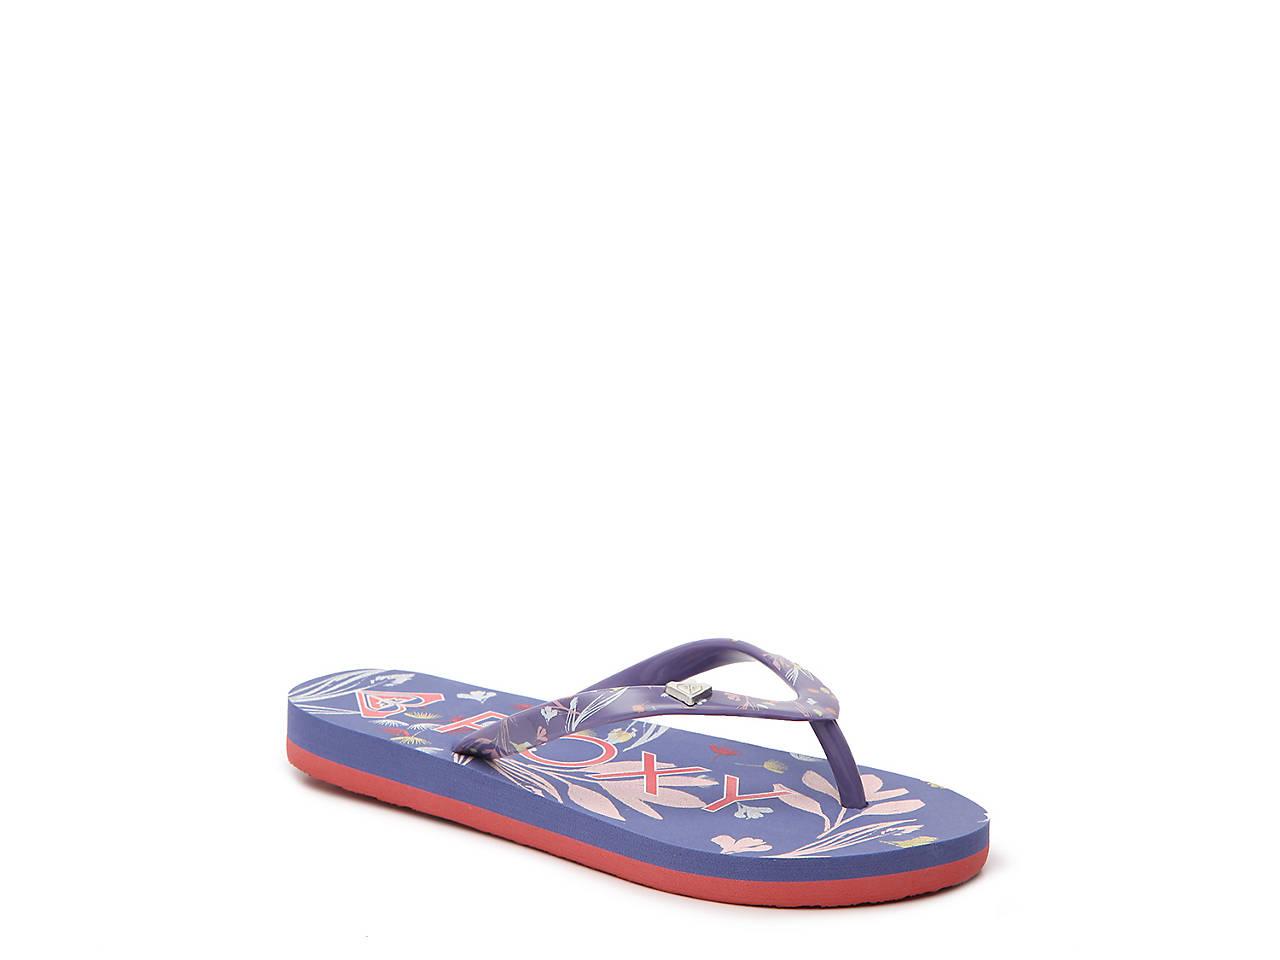 0dd5f71ea7c Roxy Pebbles Toddler   Youth Flip Flop Kids Shoes